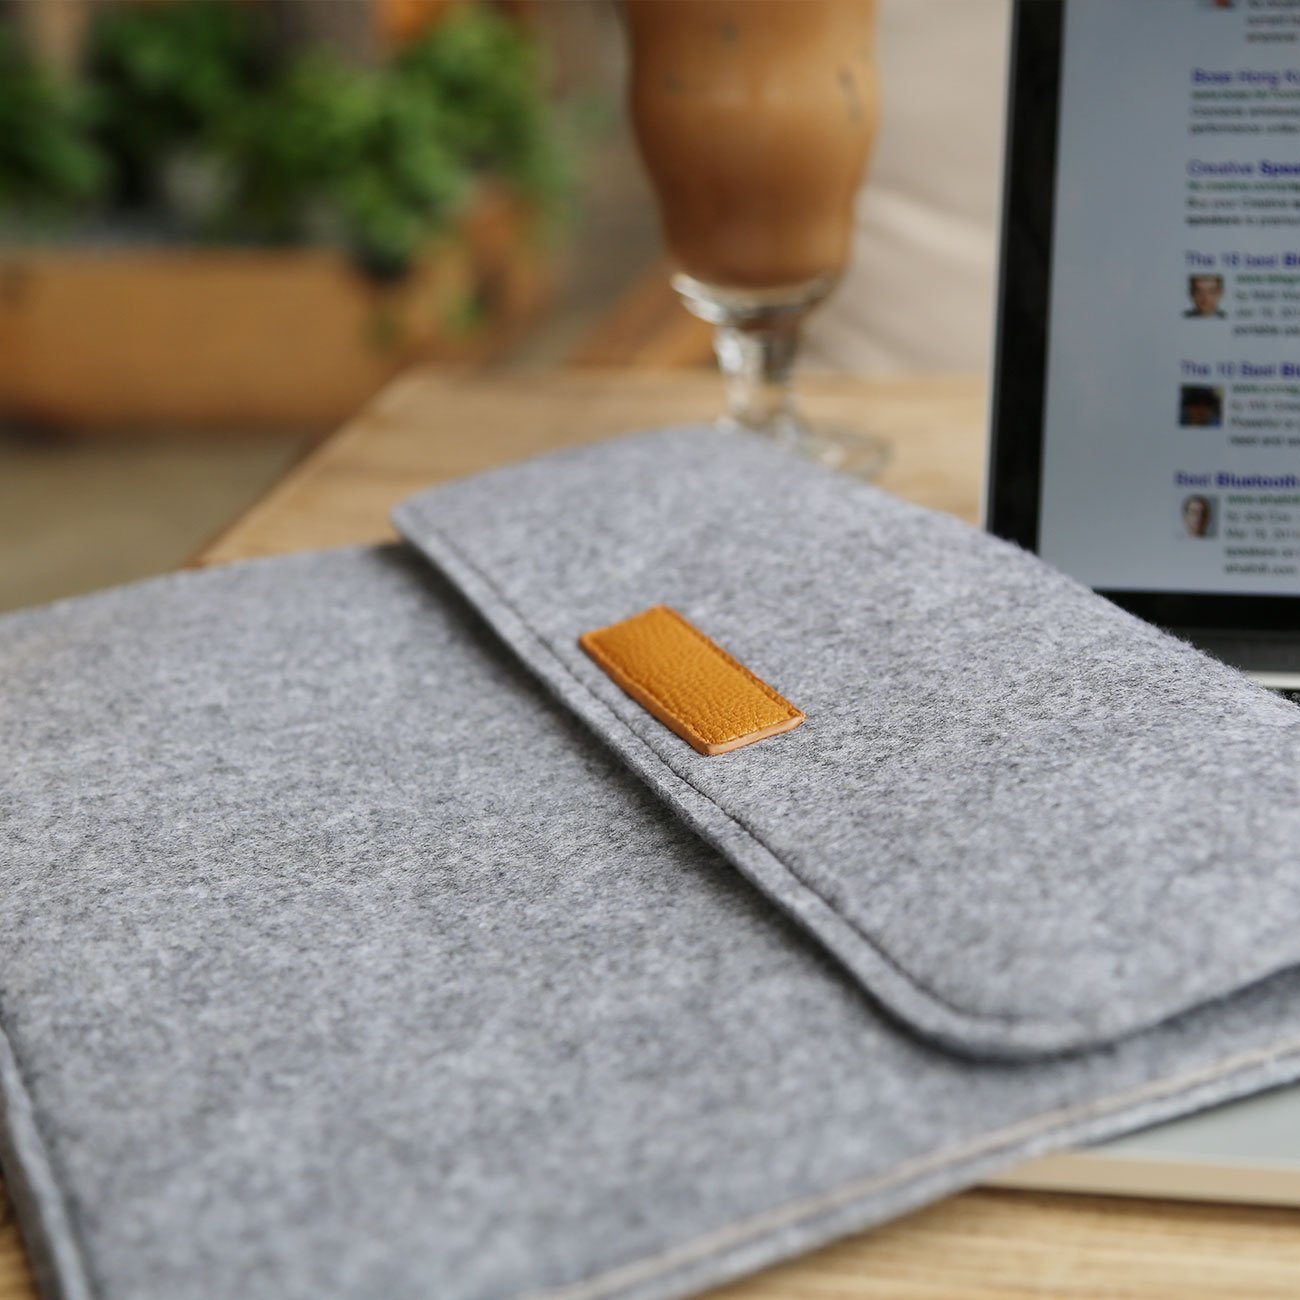 Inateck Filz Sleeve H/ülle Ultrabook Laptop Tasche Kompatibel mit MacBook pro 15,4 Zoll